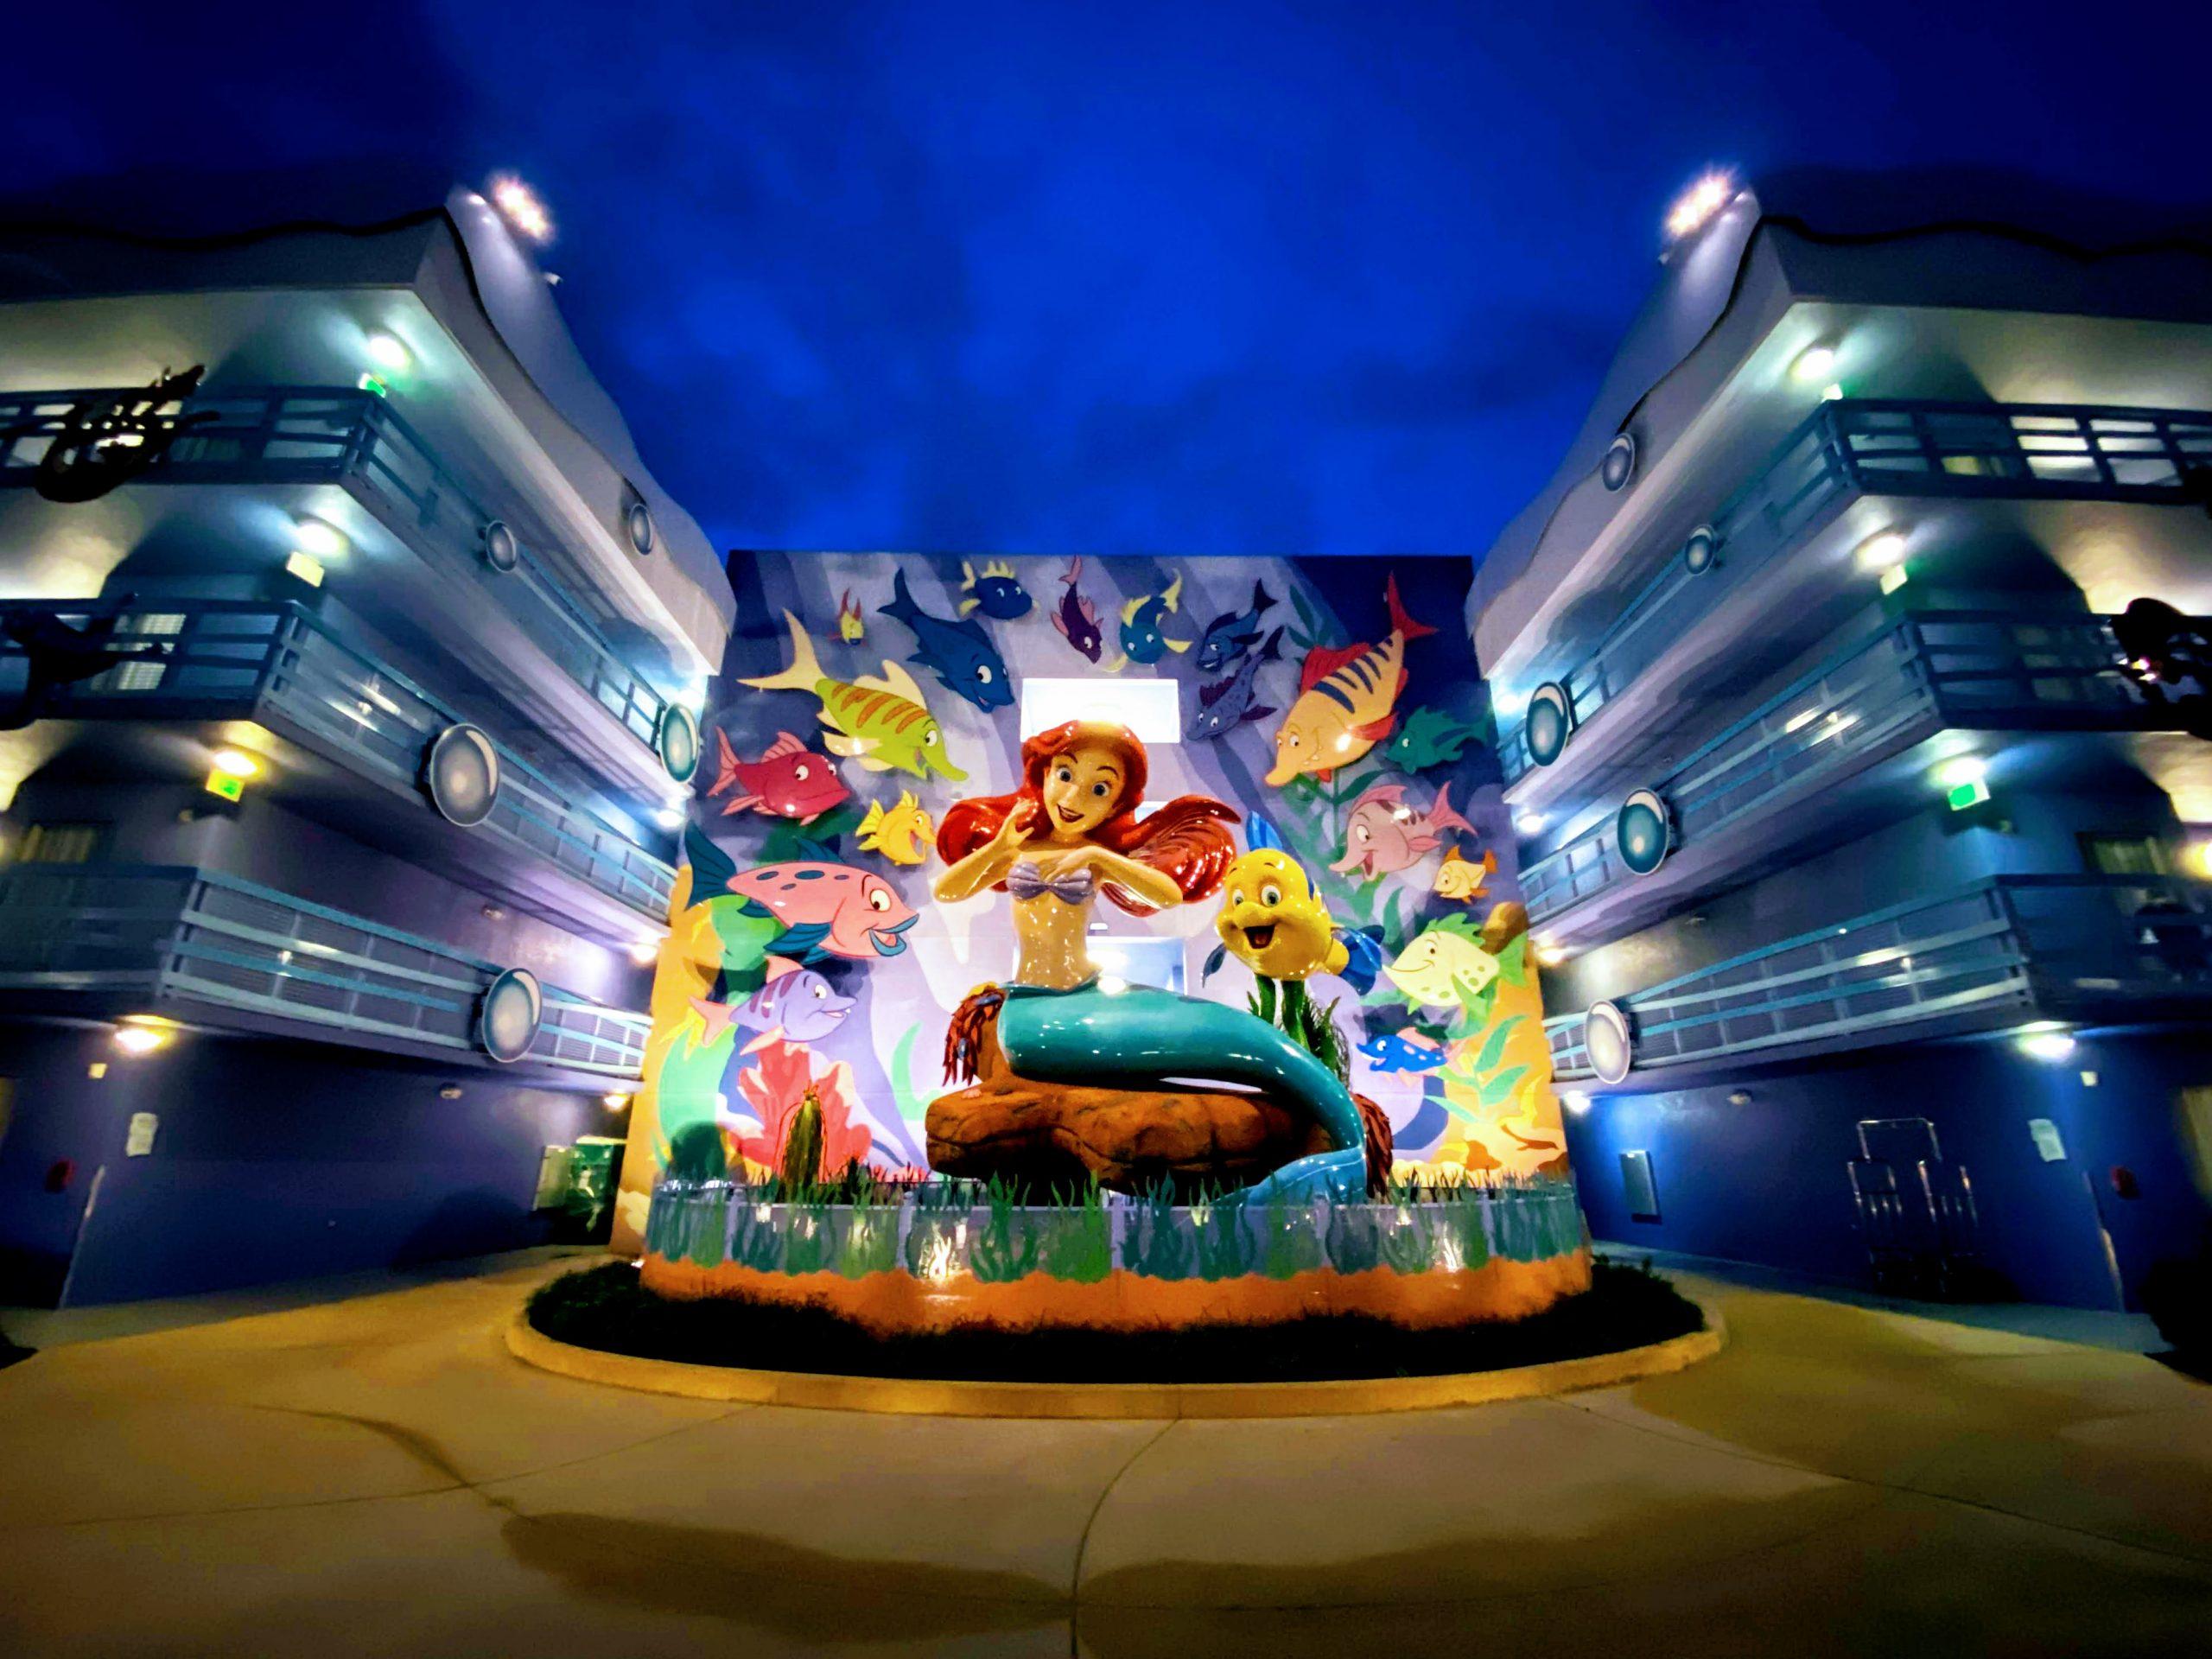 Ariel at Disney's Art of Animation